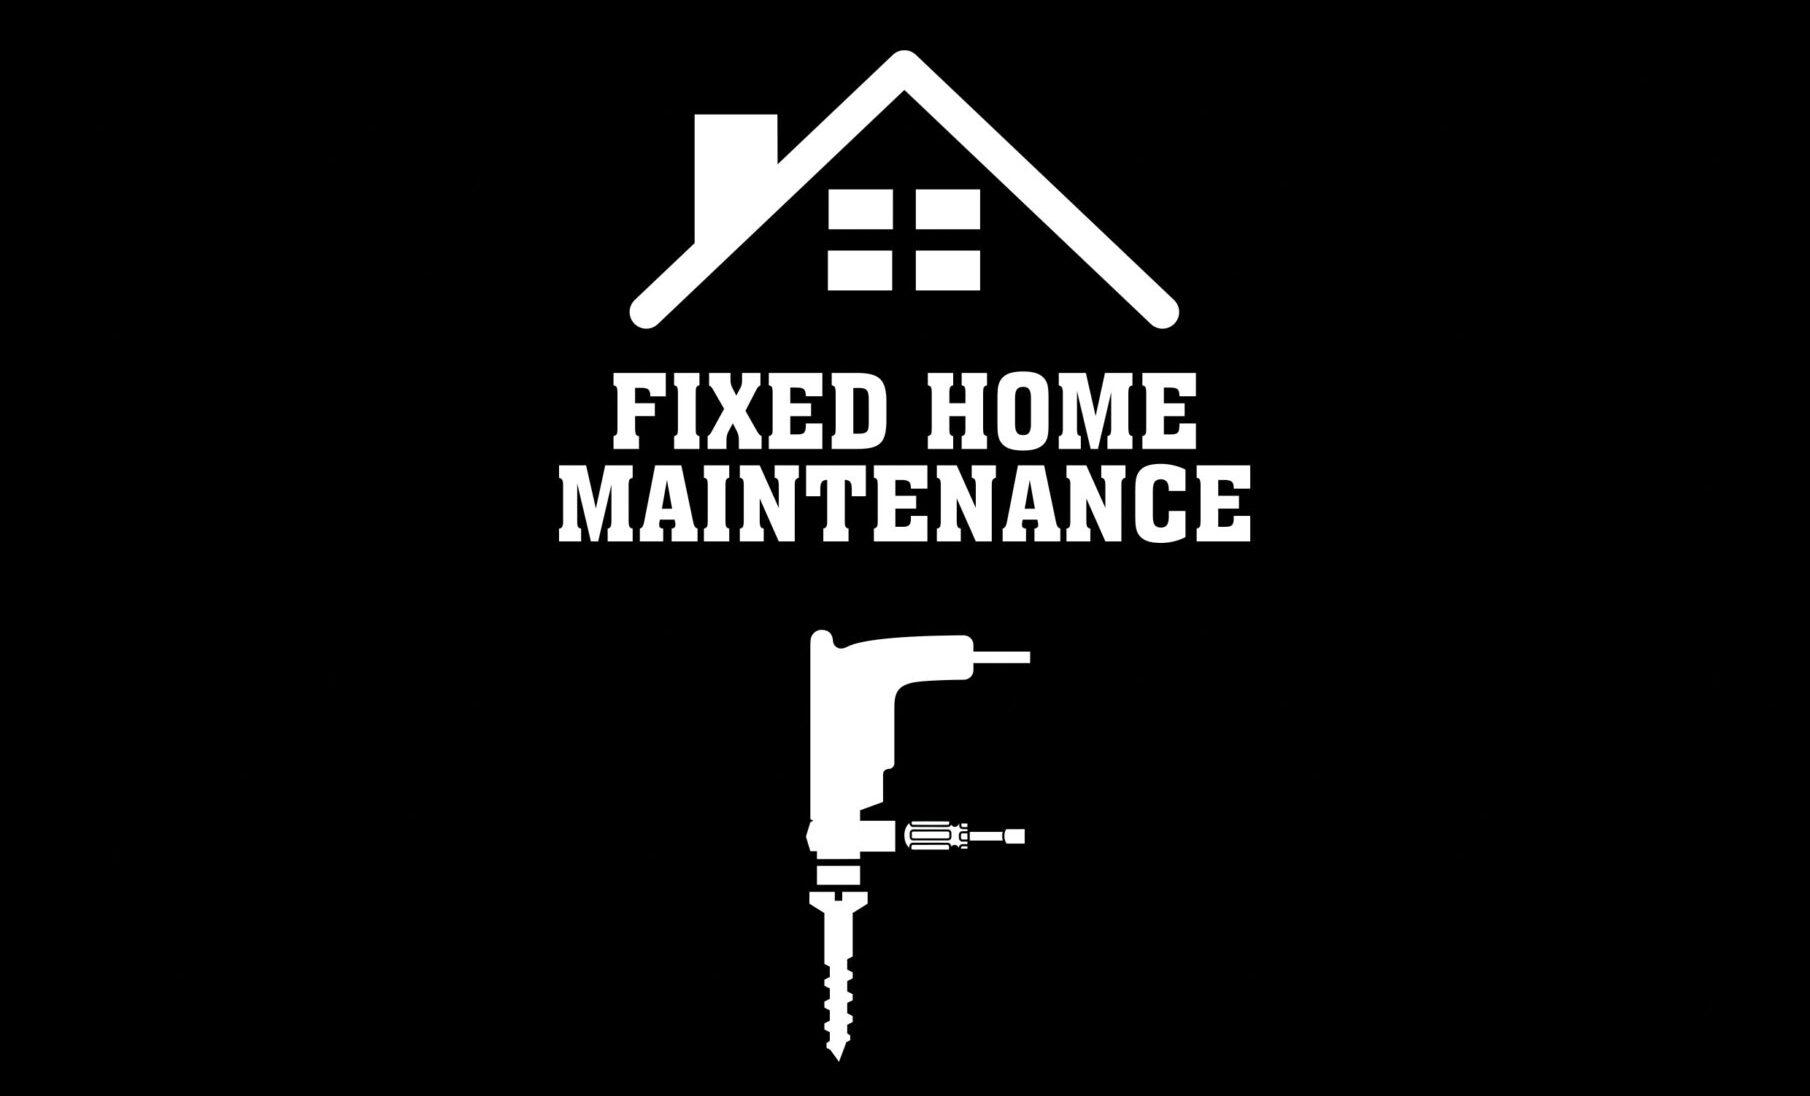 Fixed Home Maintenance